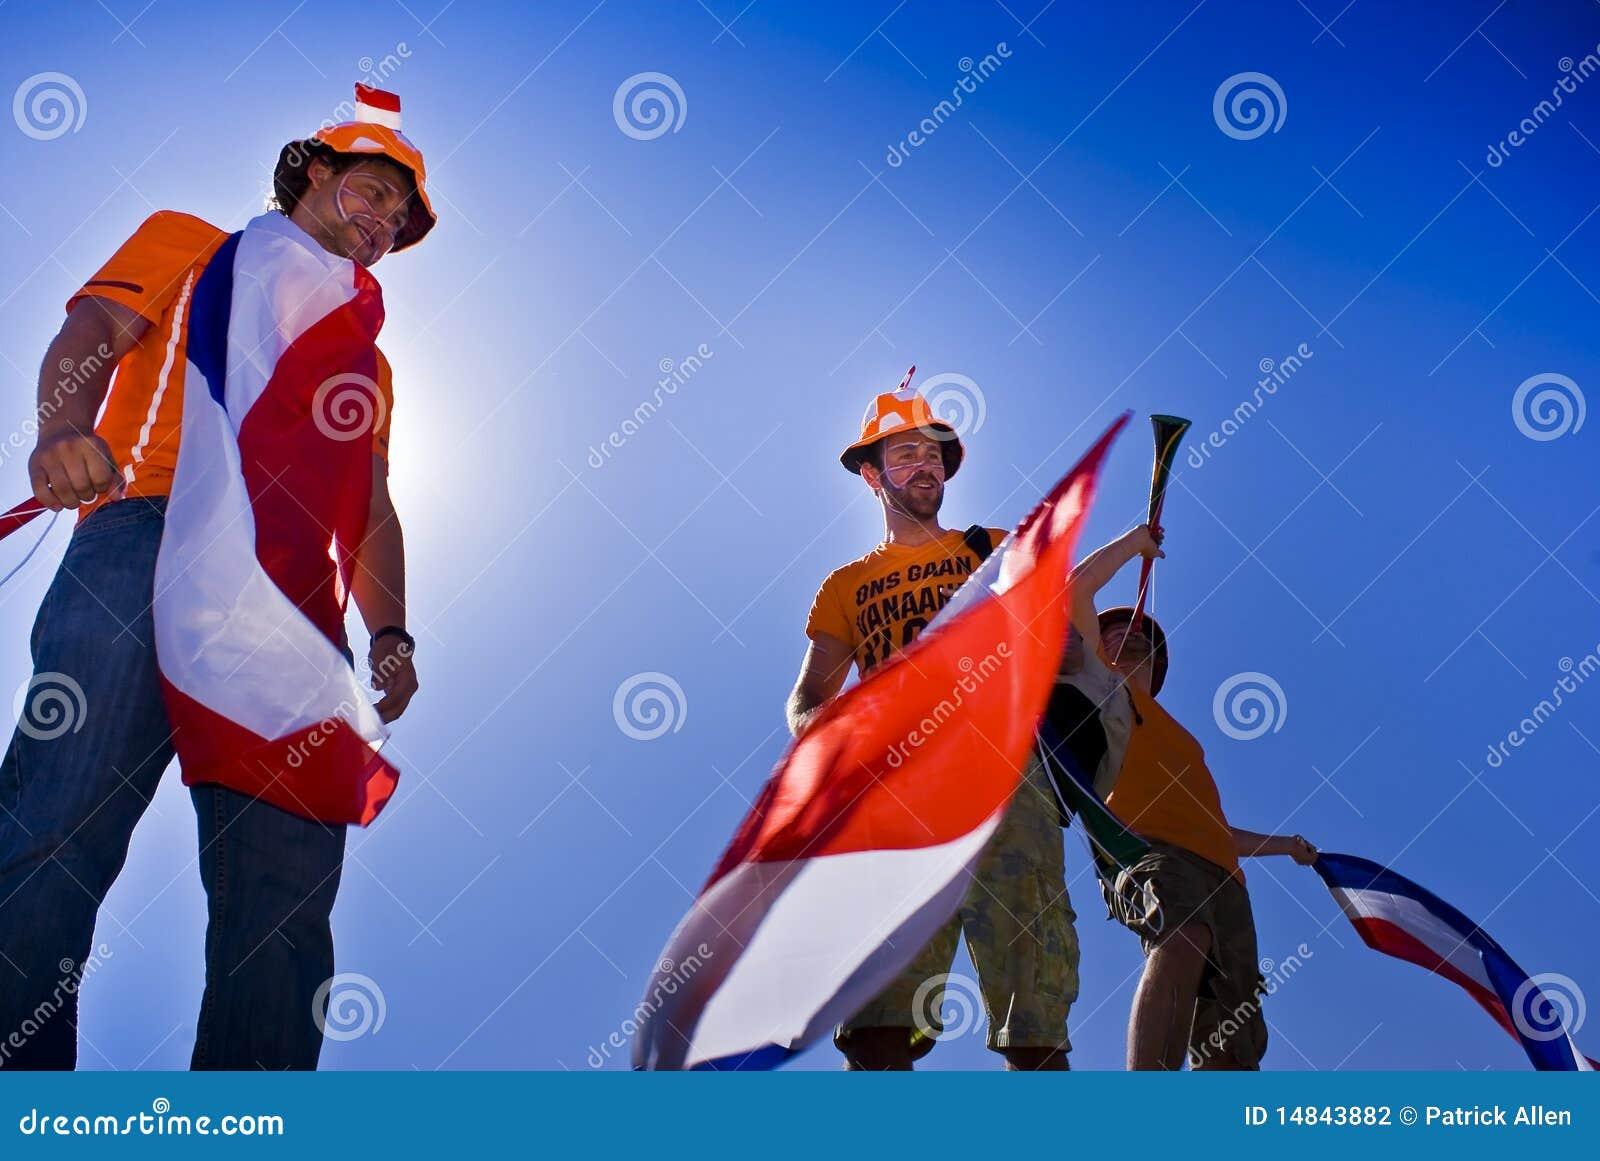 Ventilateurs de football hollandais - carte de travail 2010 de la FIFA